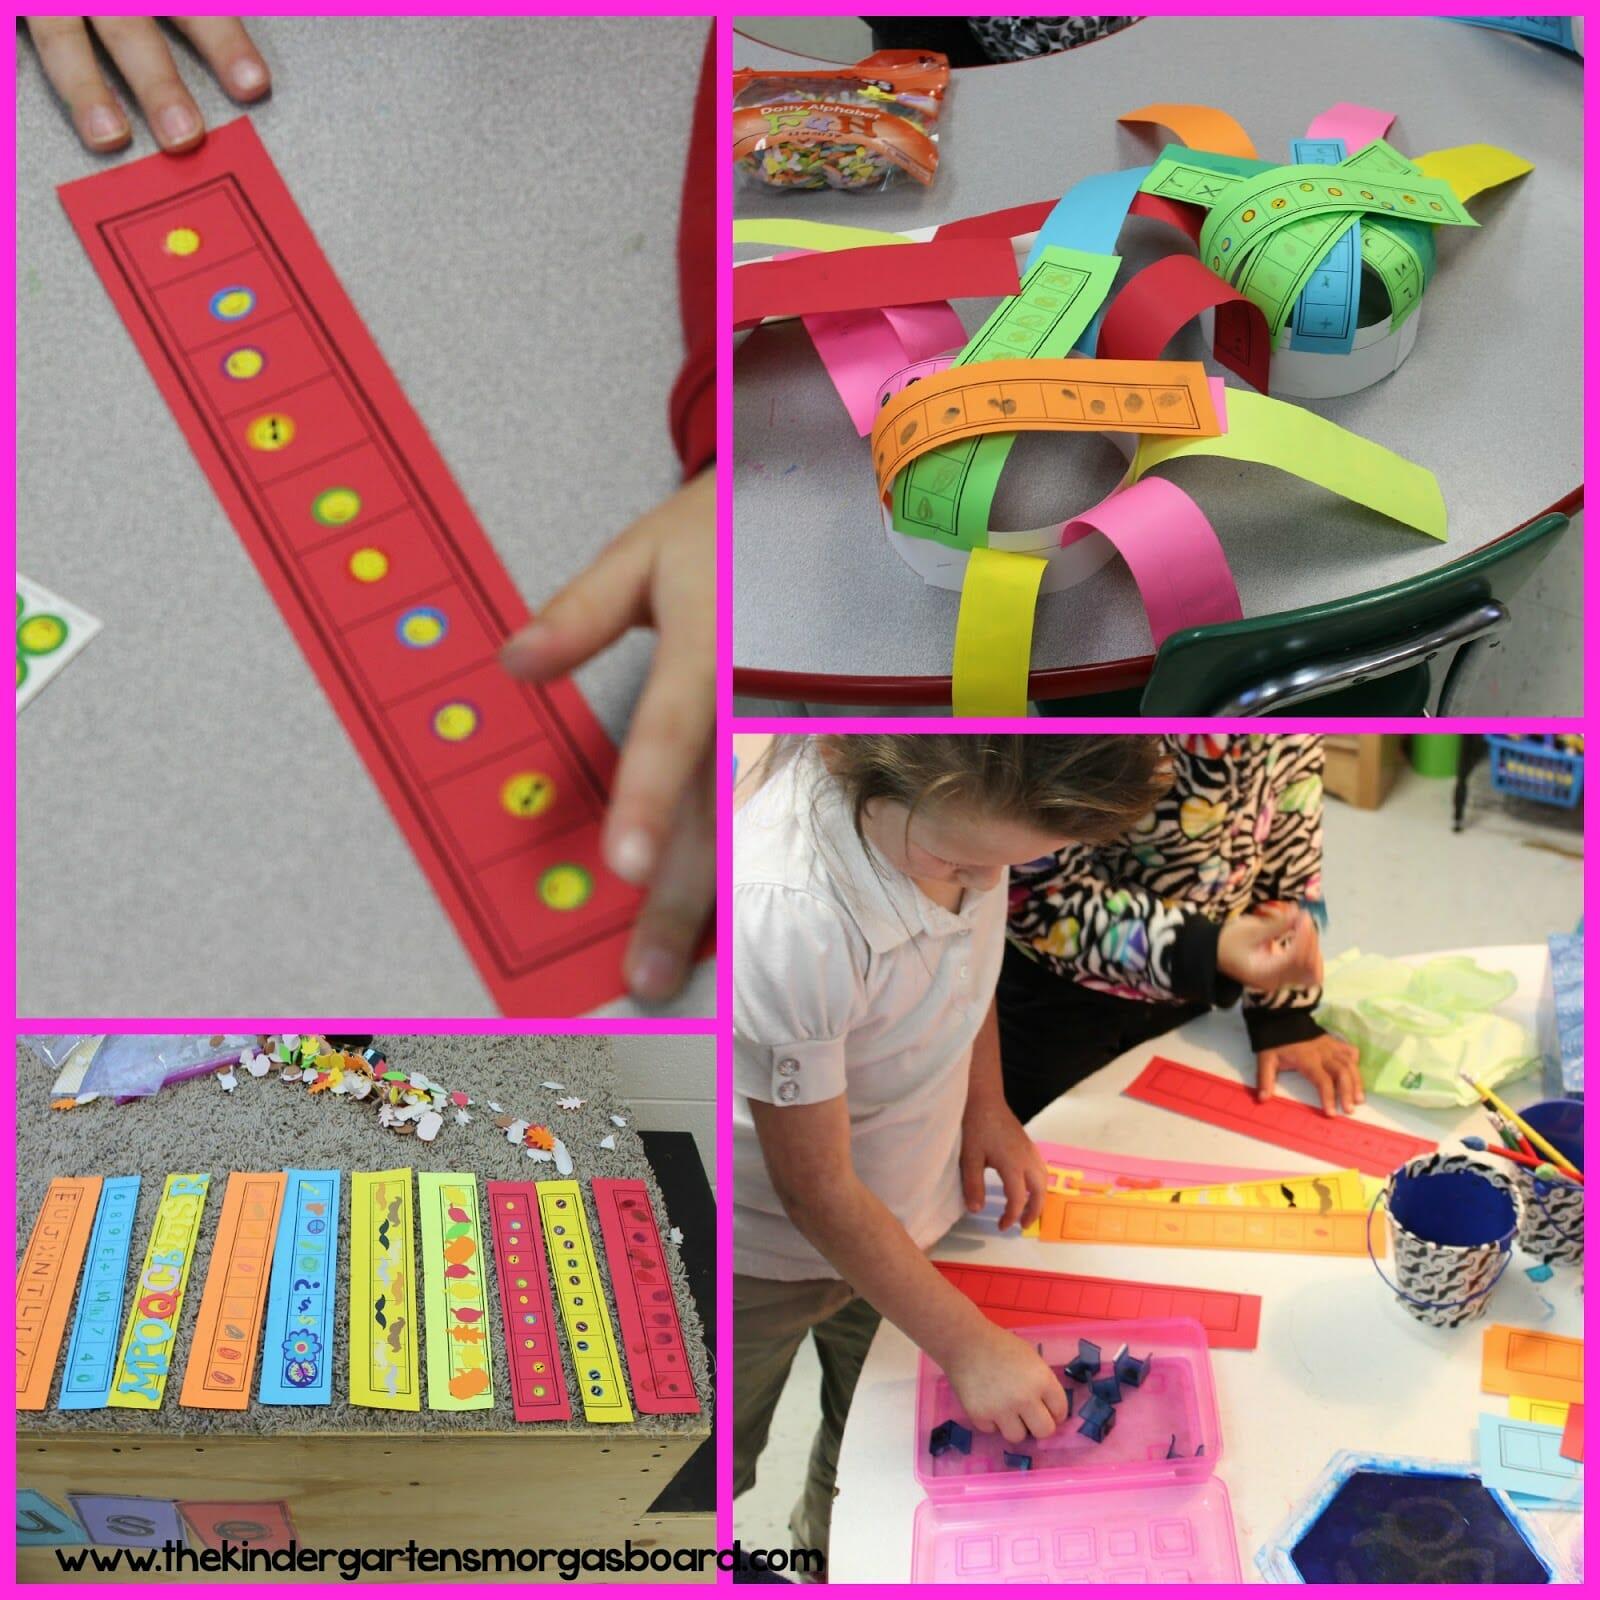 A Kindergarten Smorgasboard 100th Day Fiesta